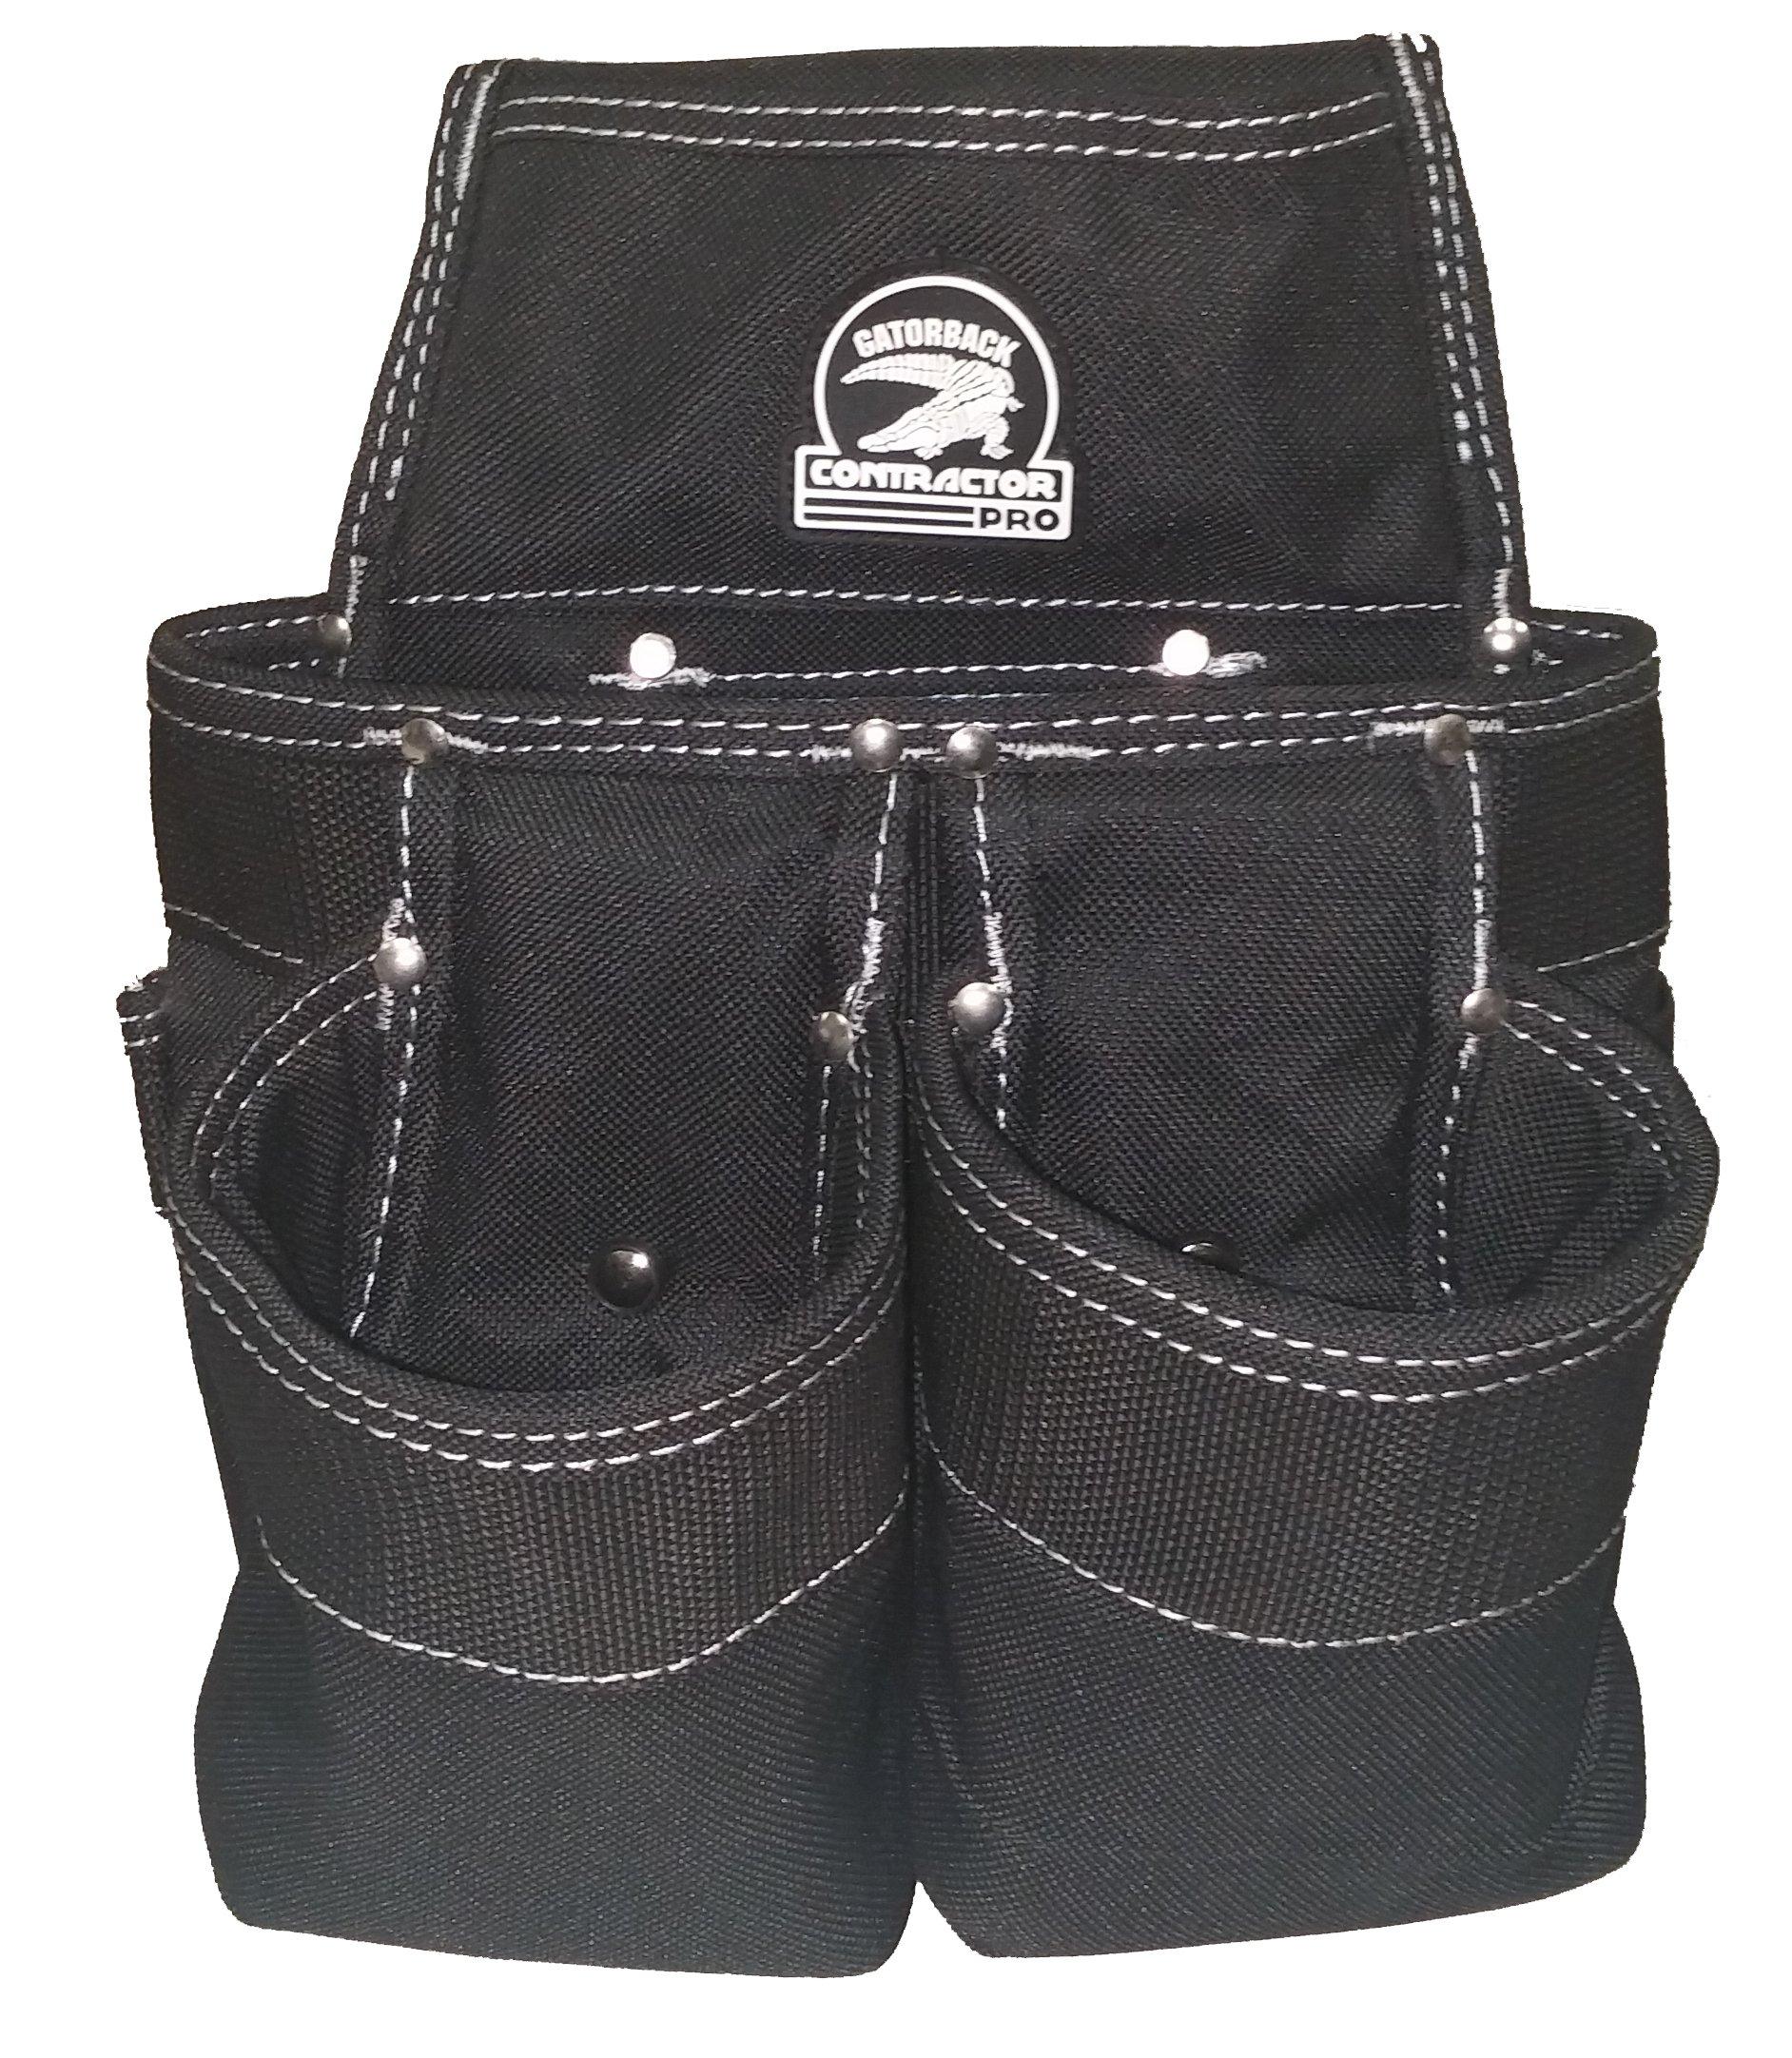 Gatorback B145 Carpenters Triple Combo w/Pro-Comfort Back Support Belt. Heavy Duty Work Belt (X-Large 40''-44'') by Gatorback (Image #4)